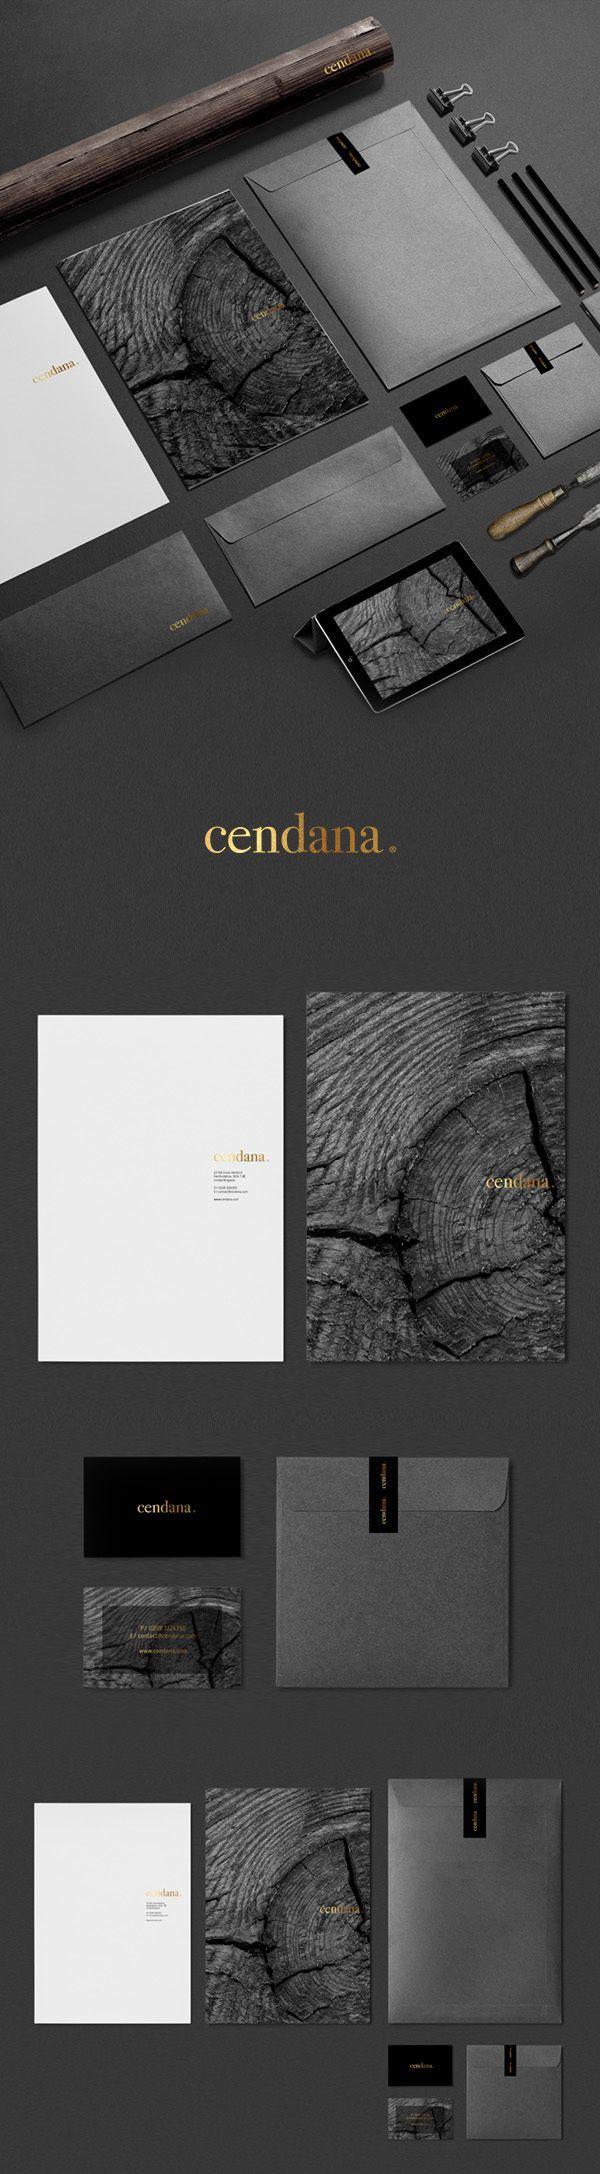 Cendana #madproduction --- if U like it, contact us at http://madproduction.it ---